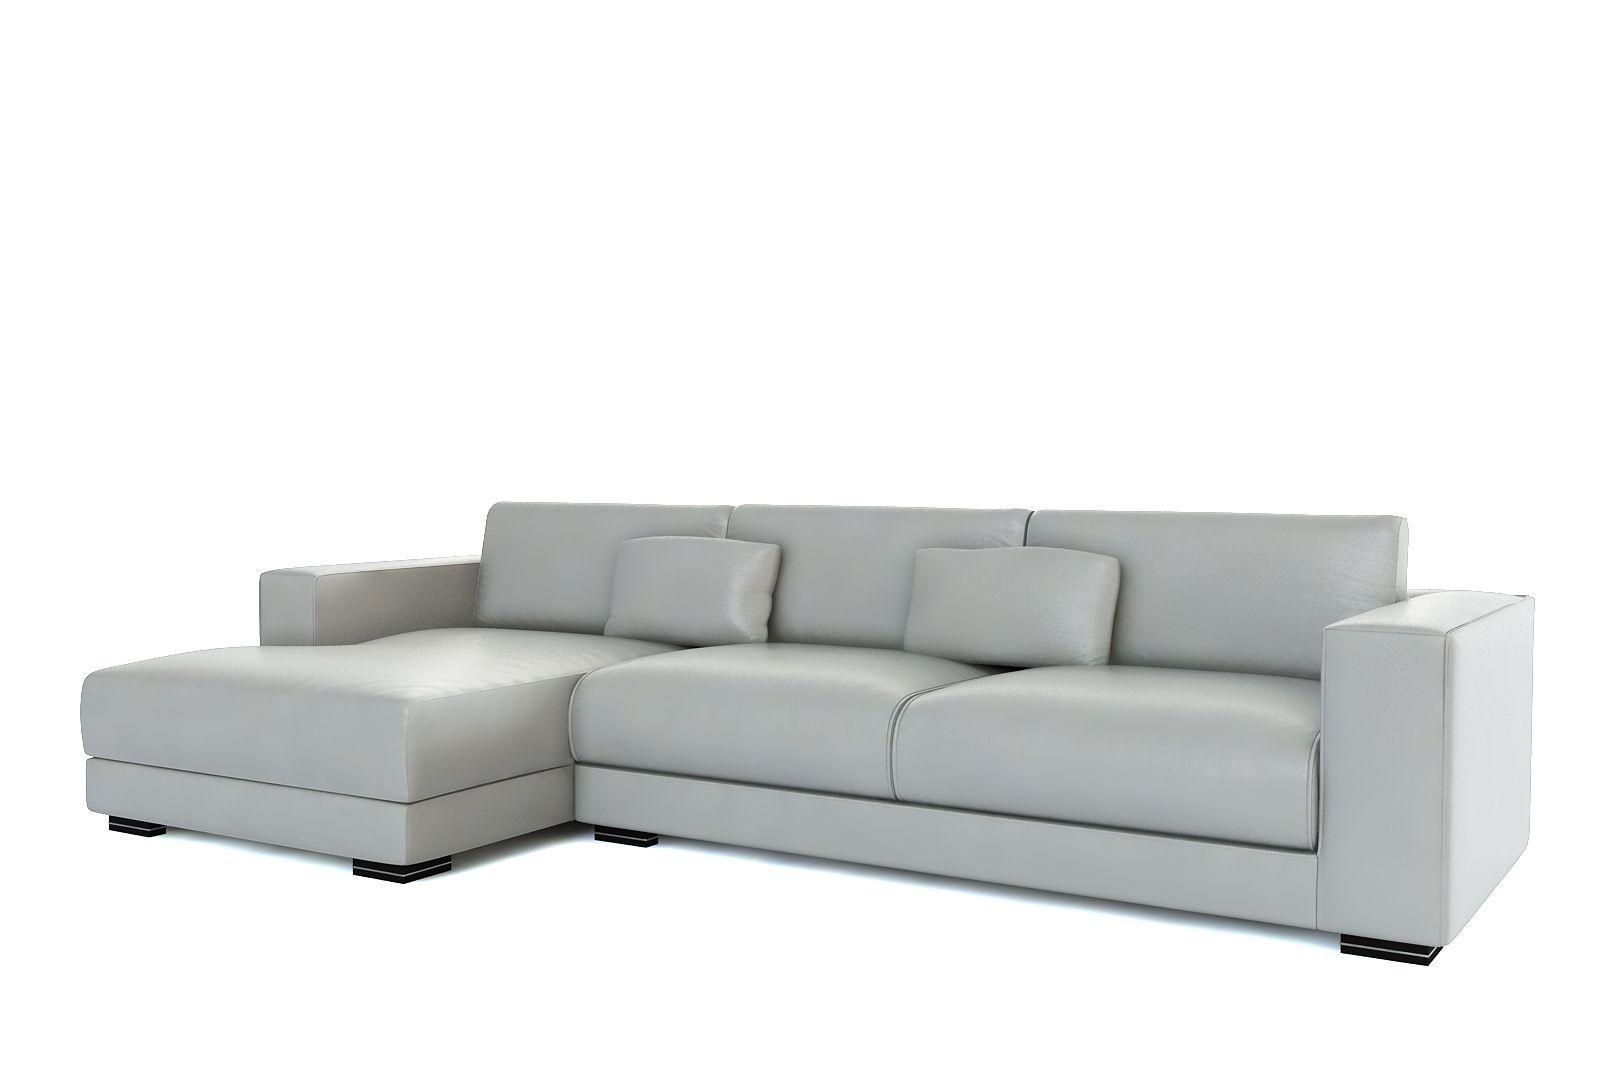 Grey Leather Sofa Light Gray Leather Sofa Set Grey Leather